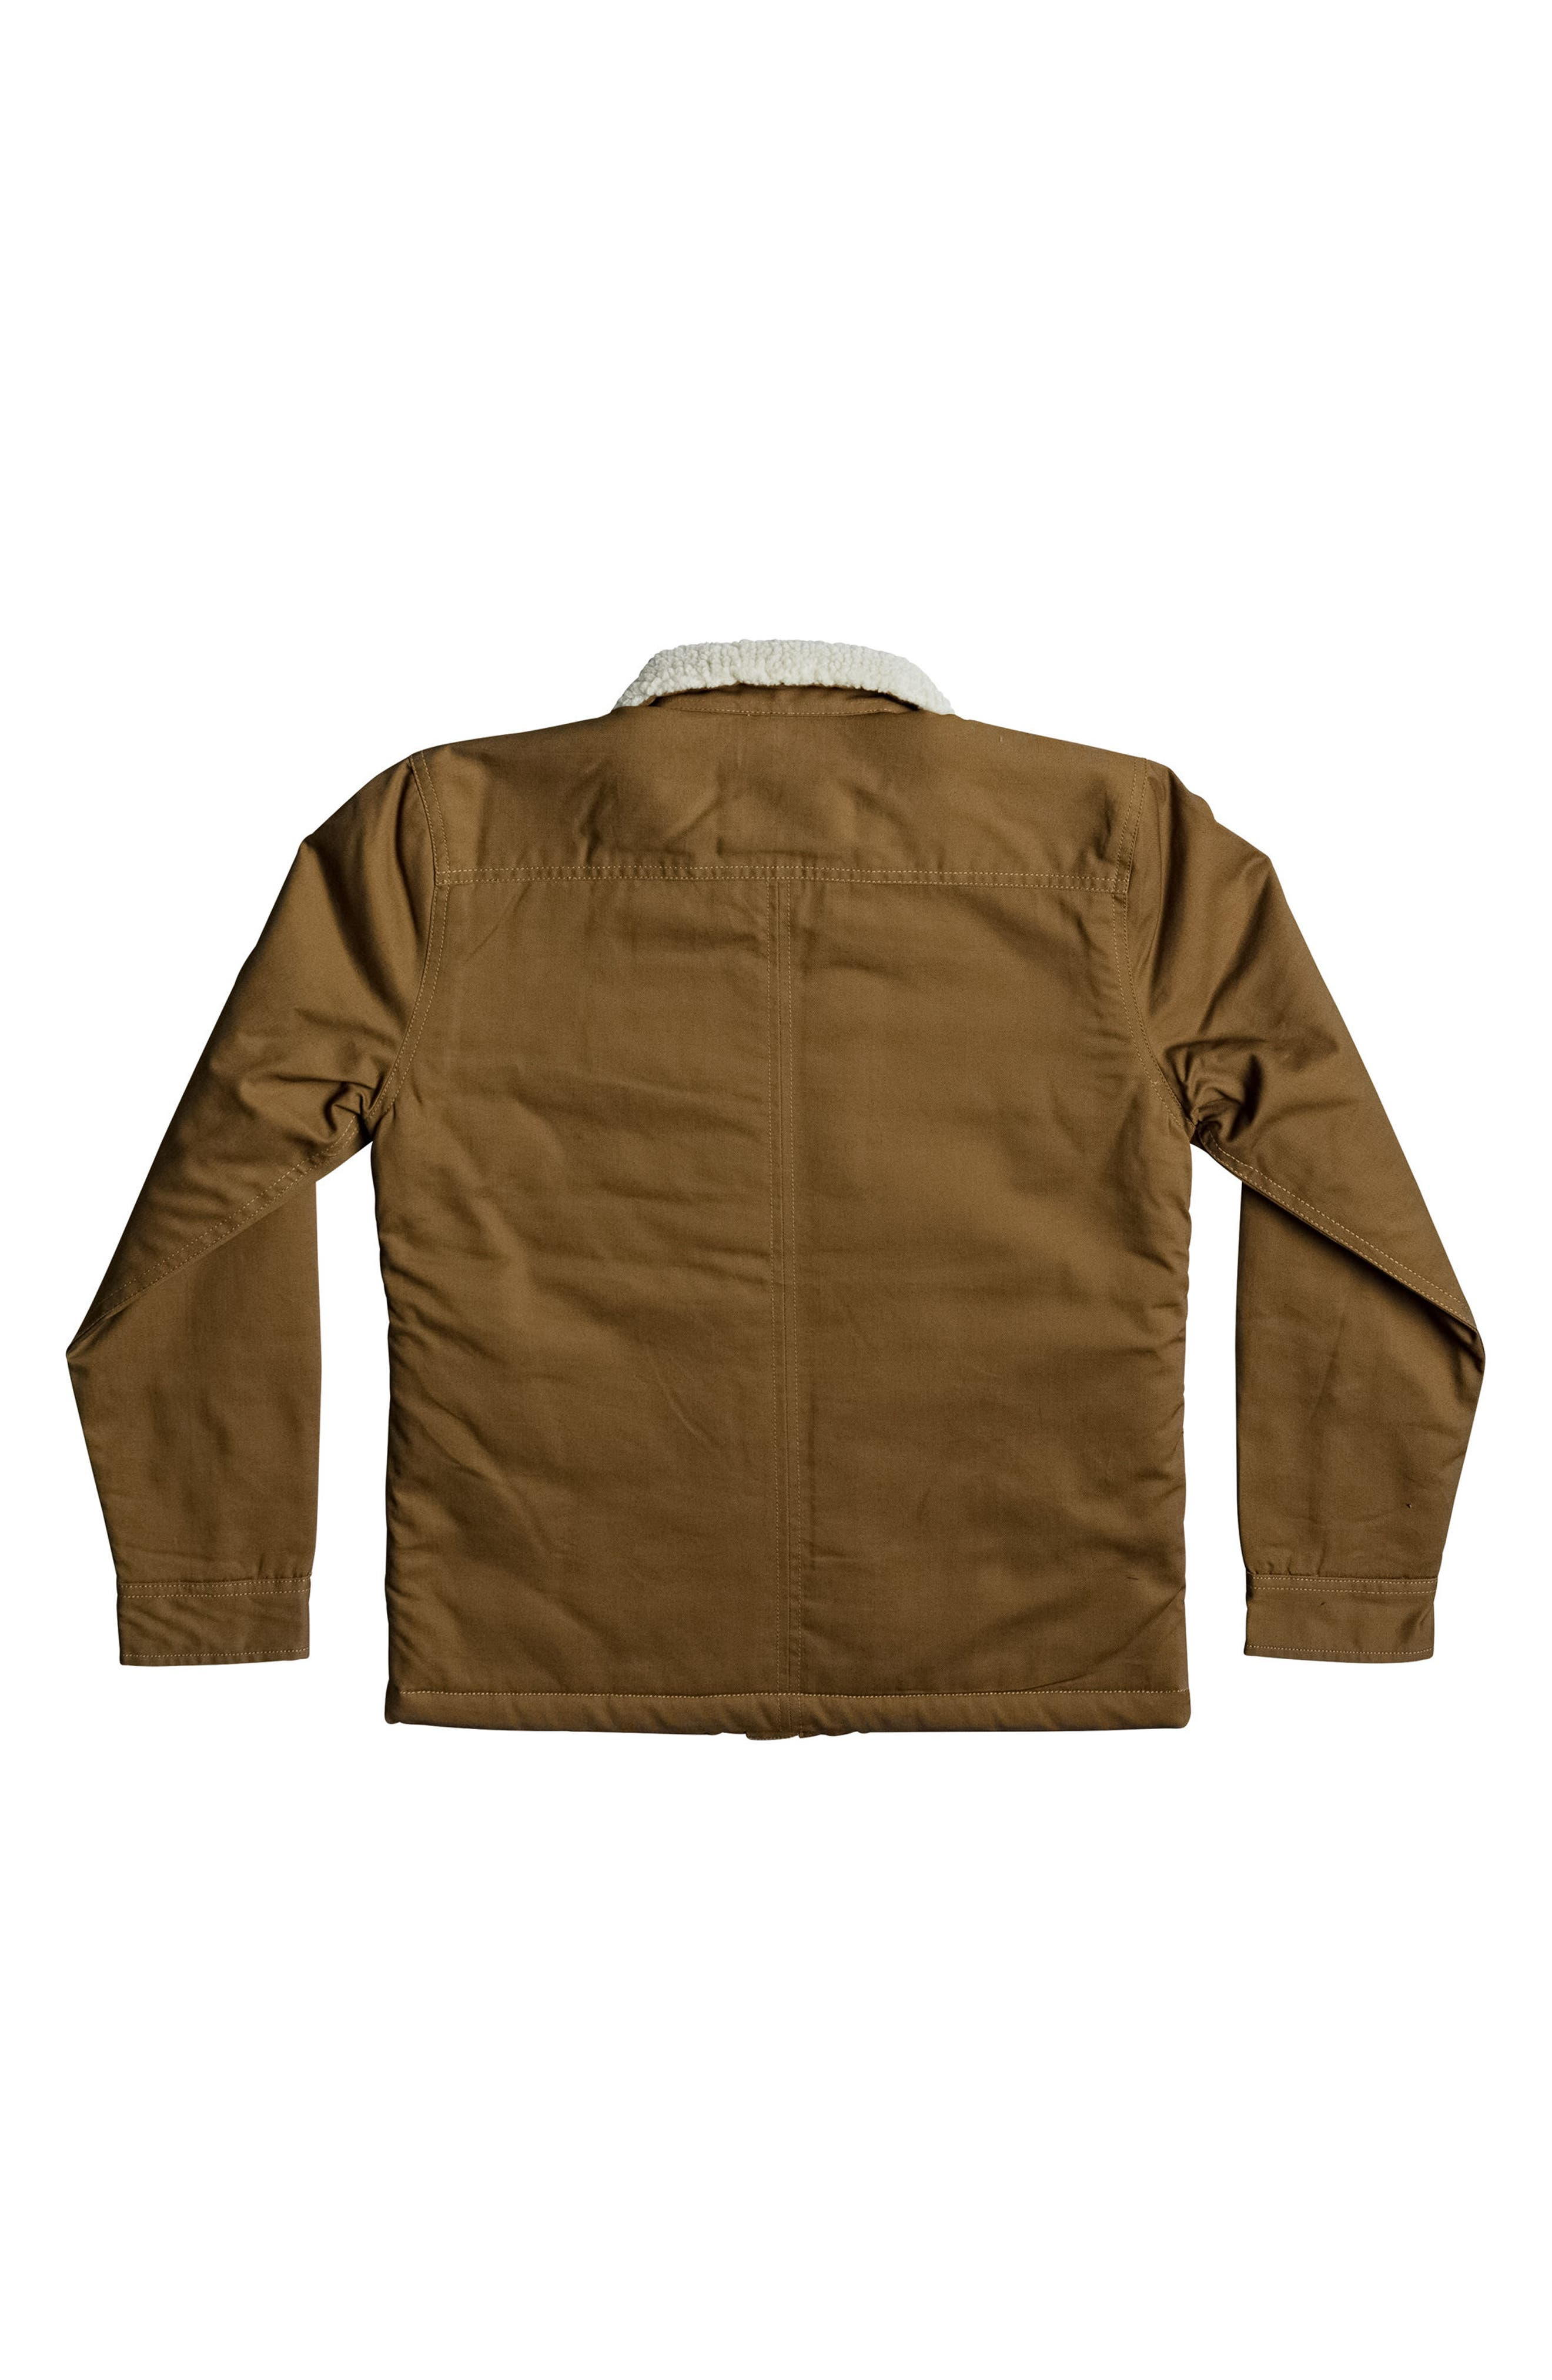 Dabein Fleece Lined Jacket,                             Alternate thumbnail 2, color,                             201